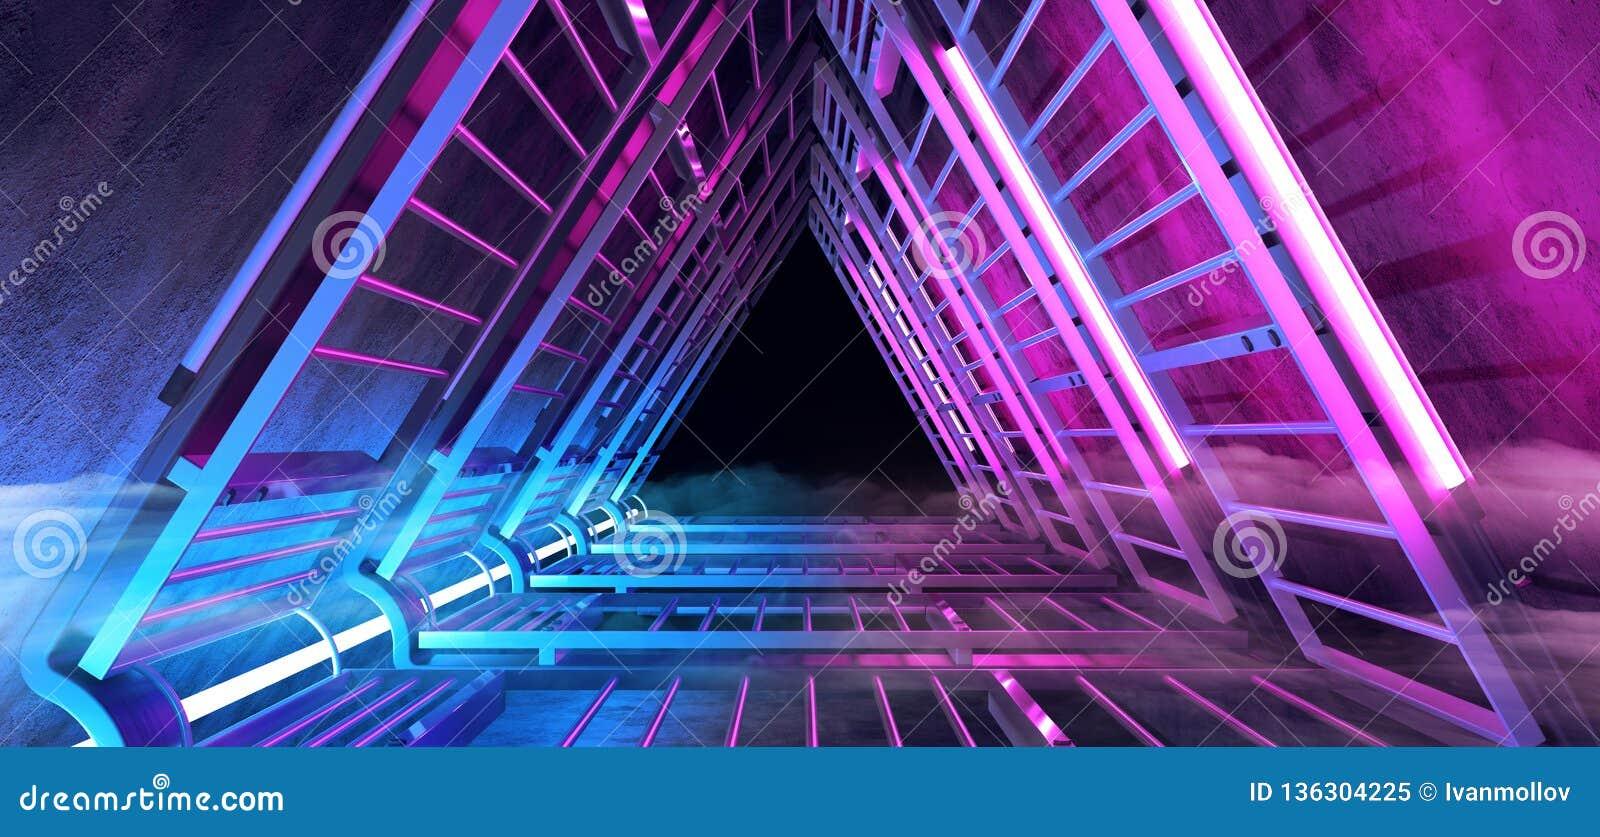 Couloir rougeoyant au néon de tunnel formé par triangle bleue pourpre de brouillard futuriste de fumée de Sci fi avec les constru